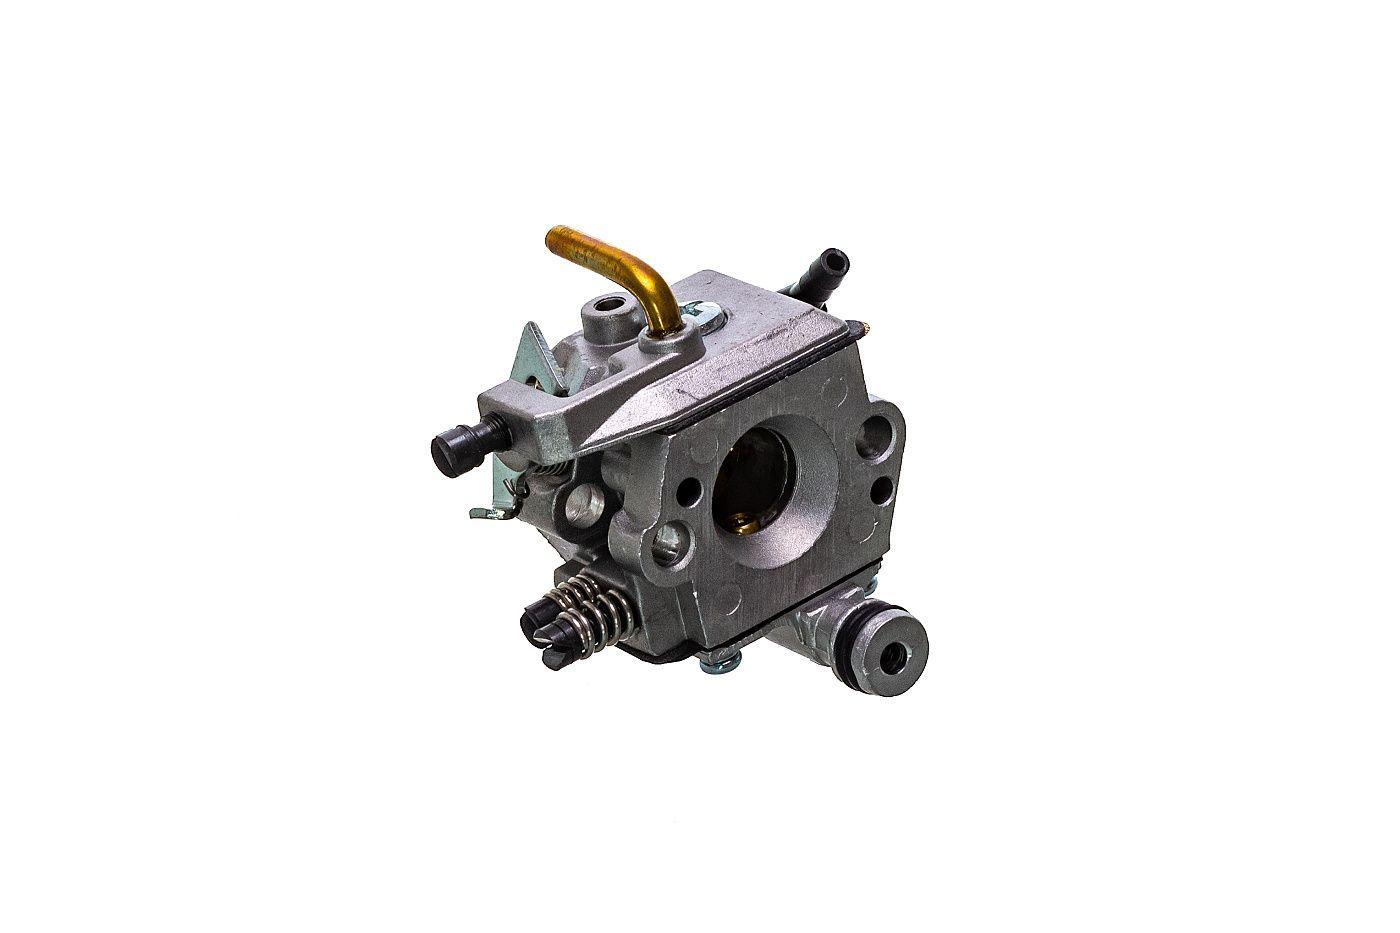 Karburátor Stihl 024 AV 024AV MS 240 Super, 026 AV 026AV MS 260 MS260 typ ZAMA